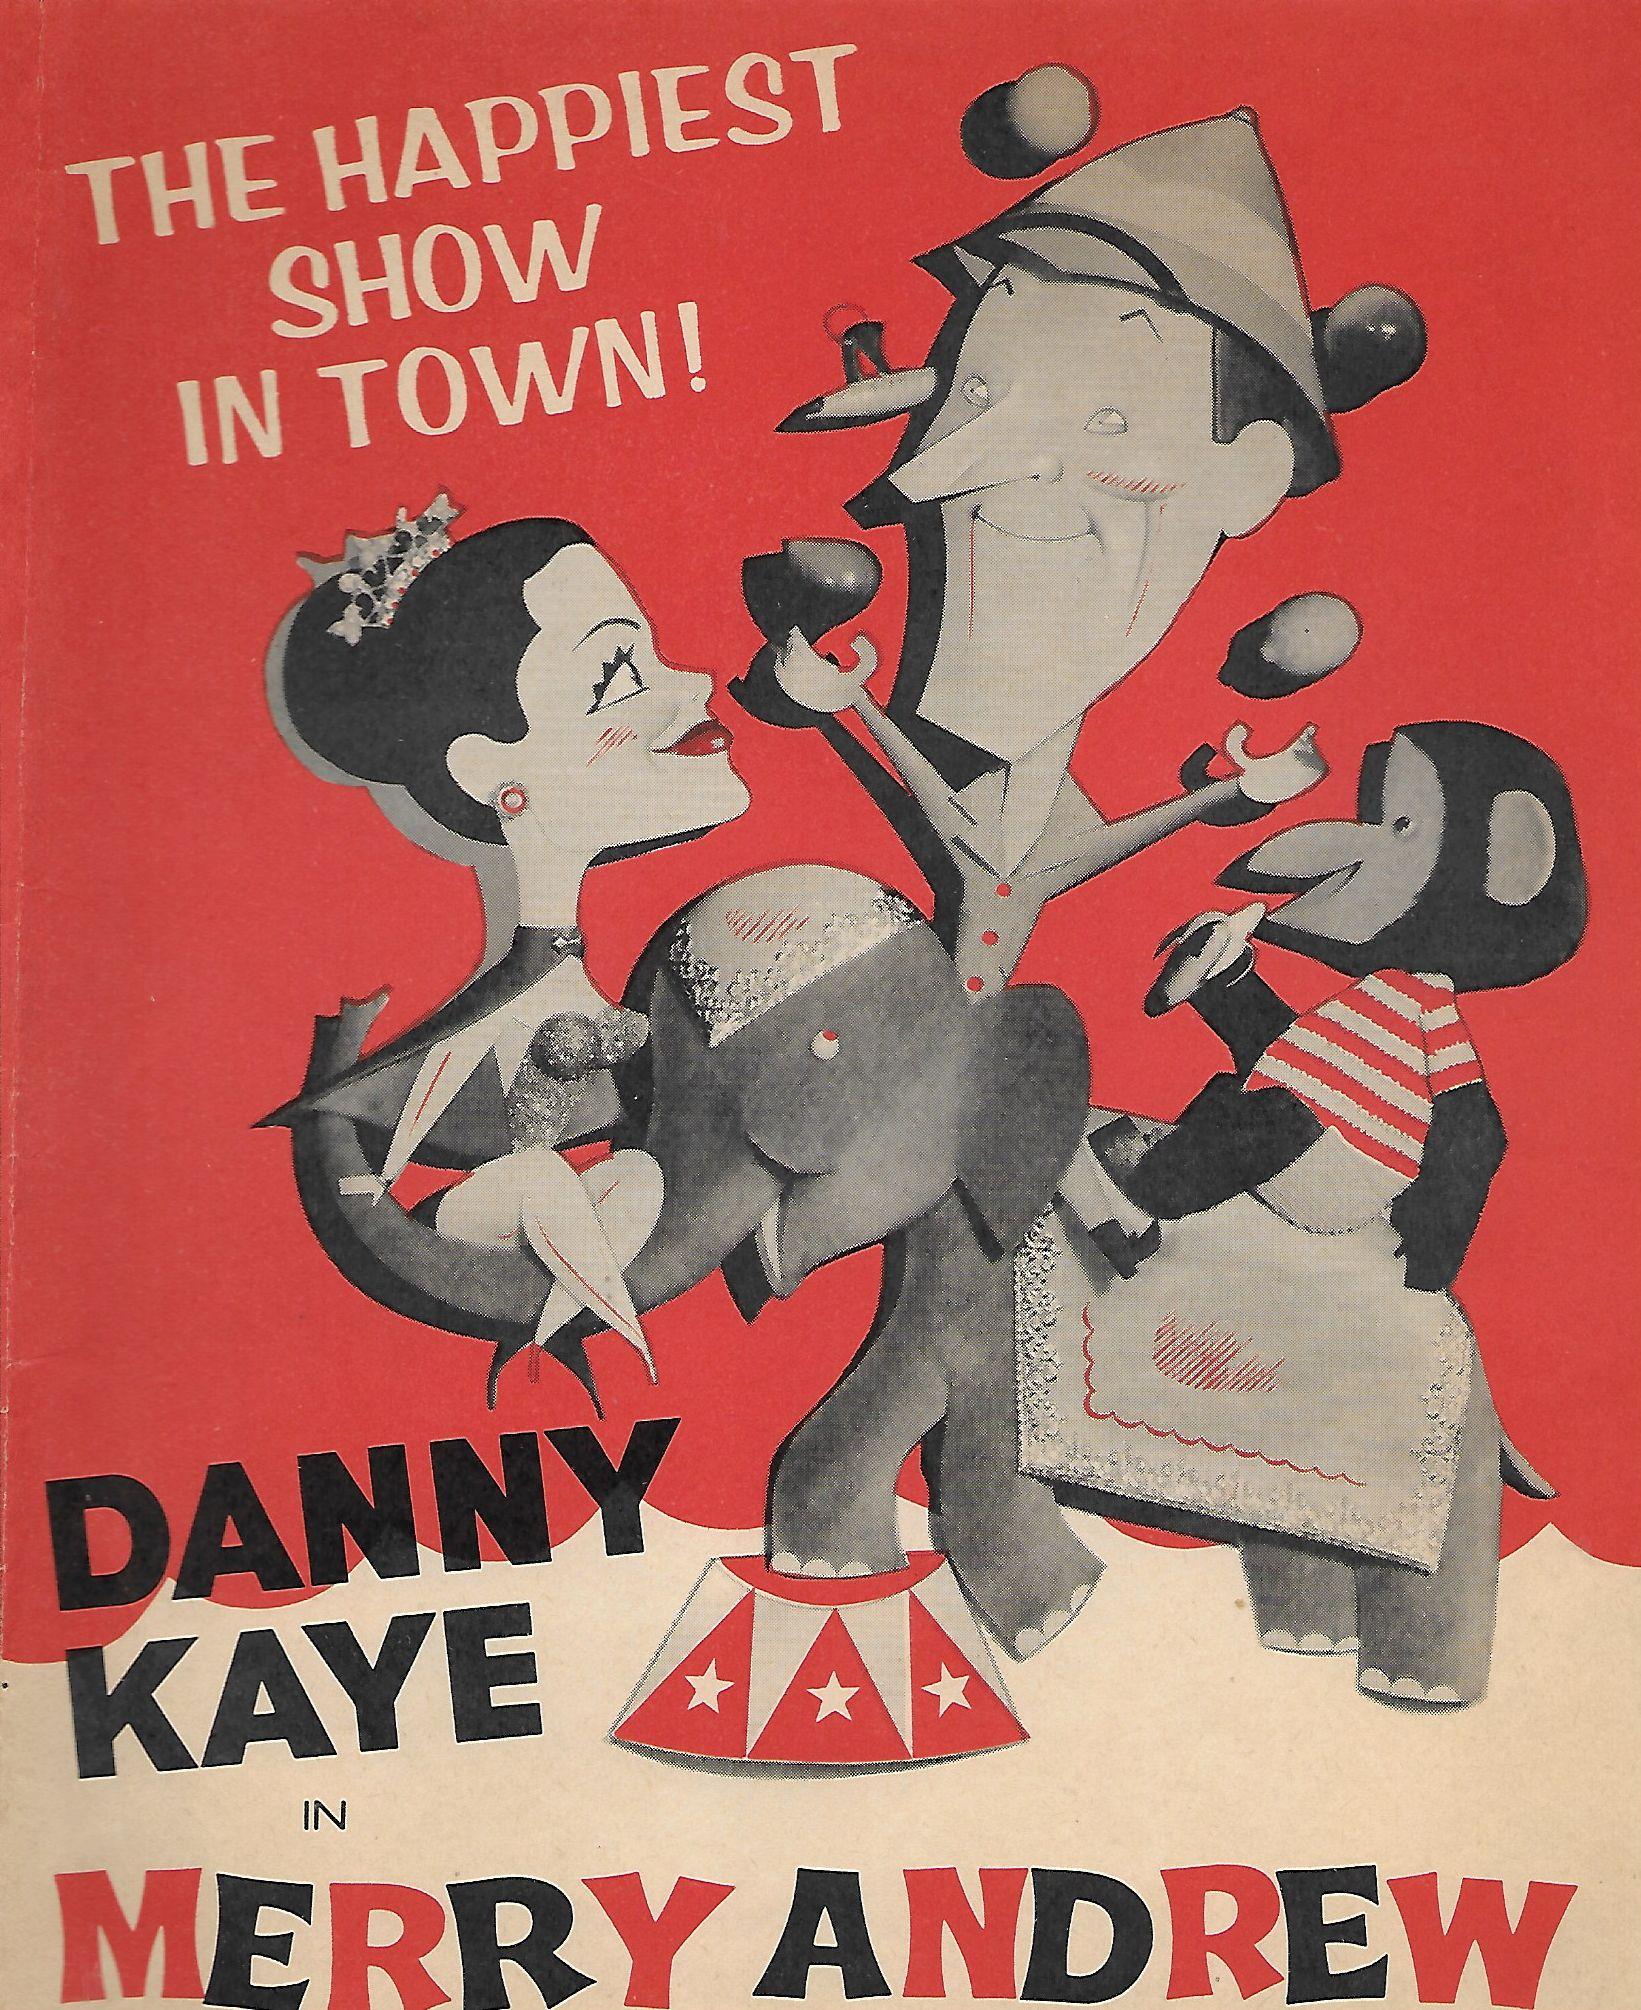 Danny Kaye in Merry Andrew (1958)